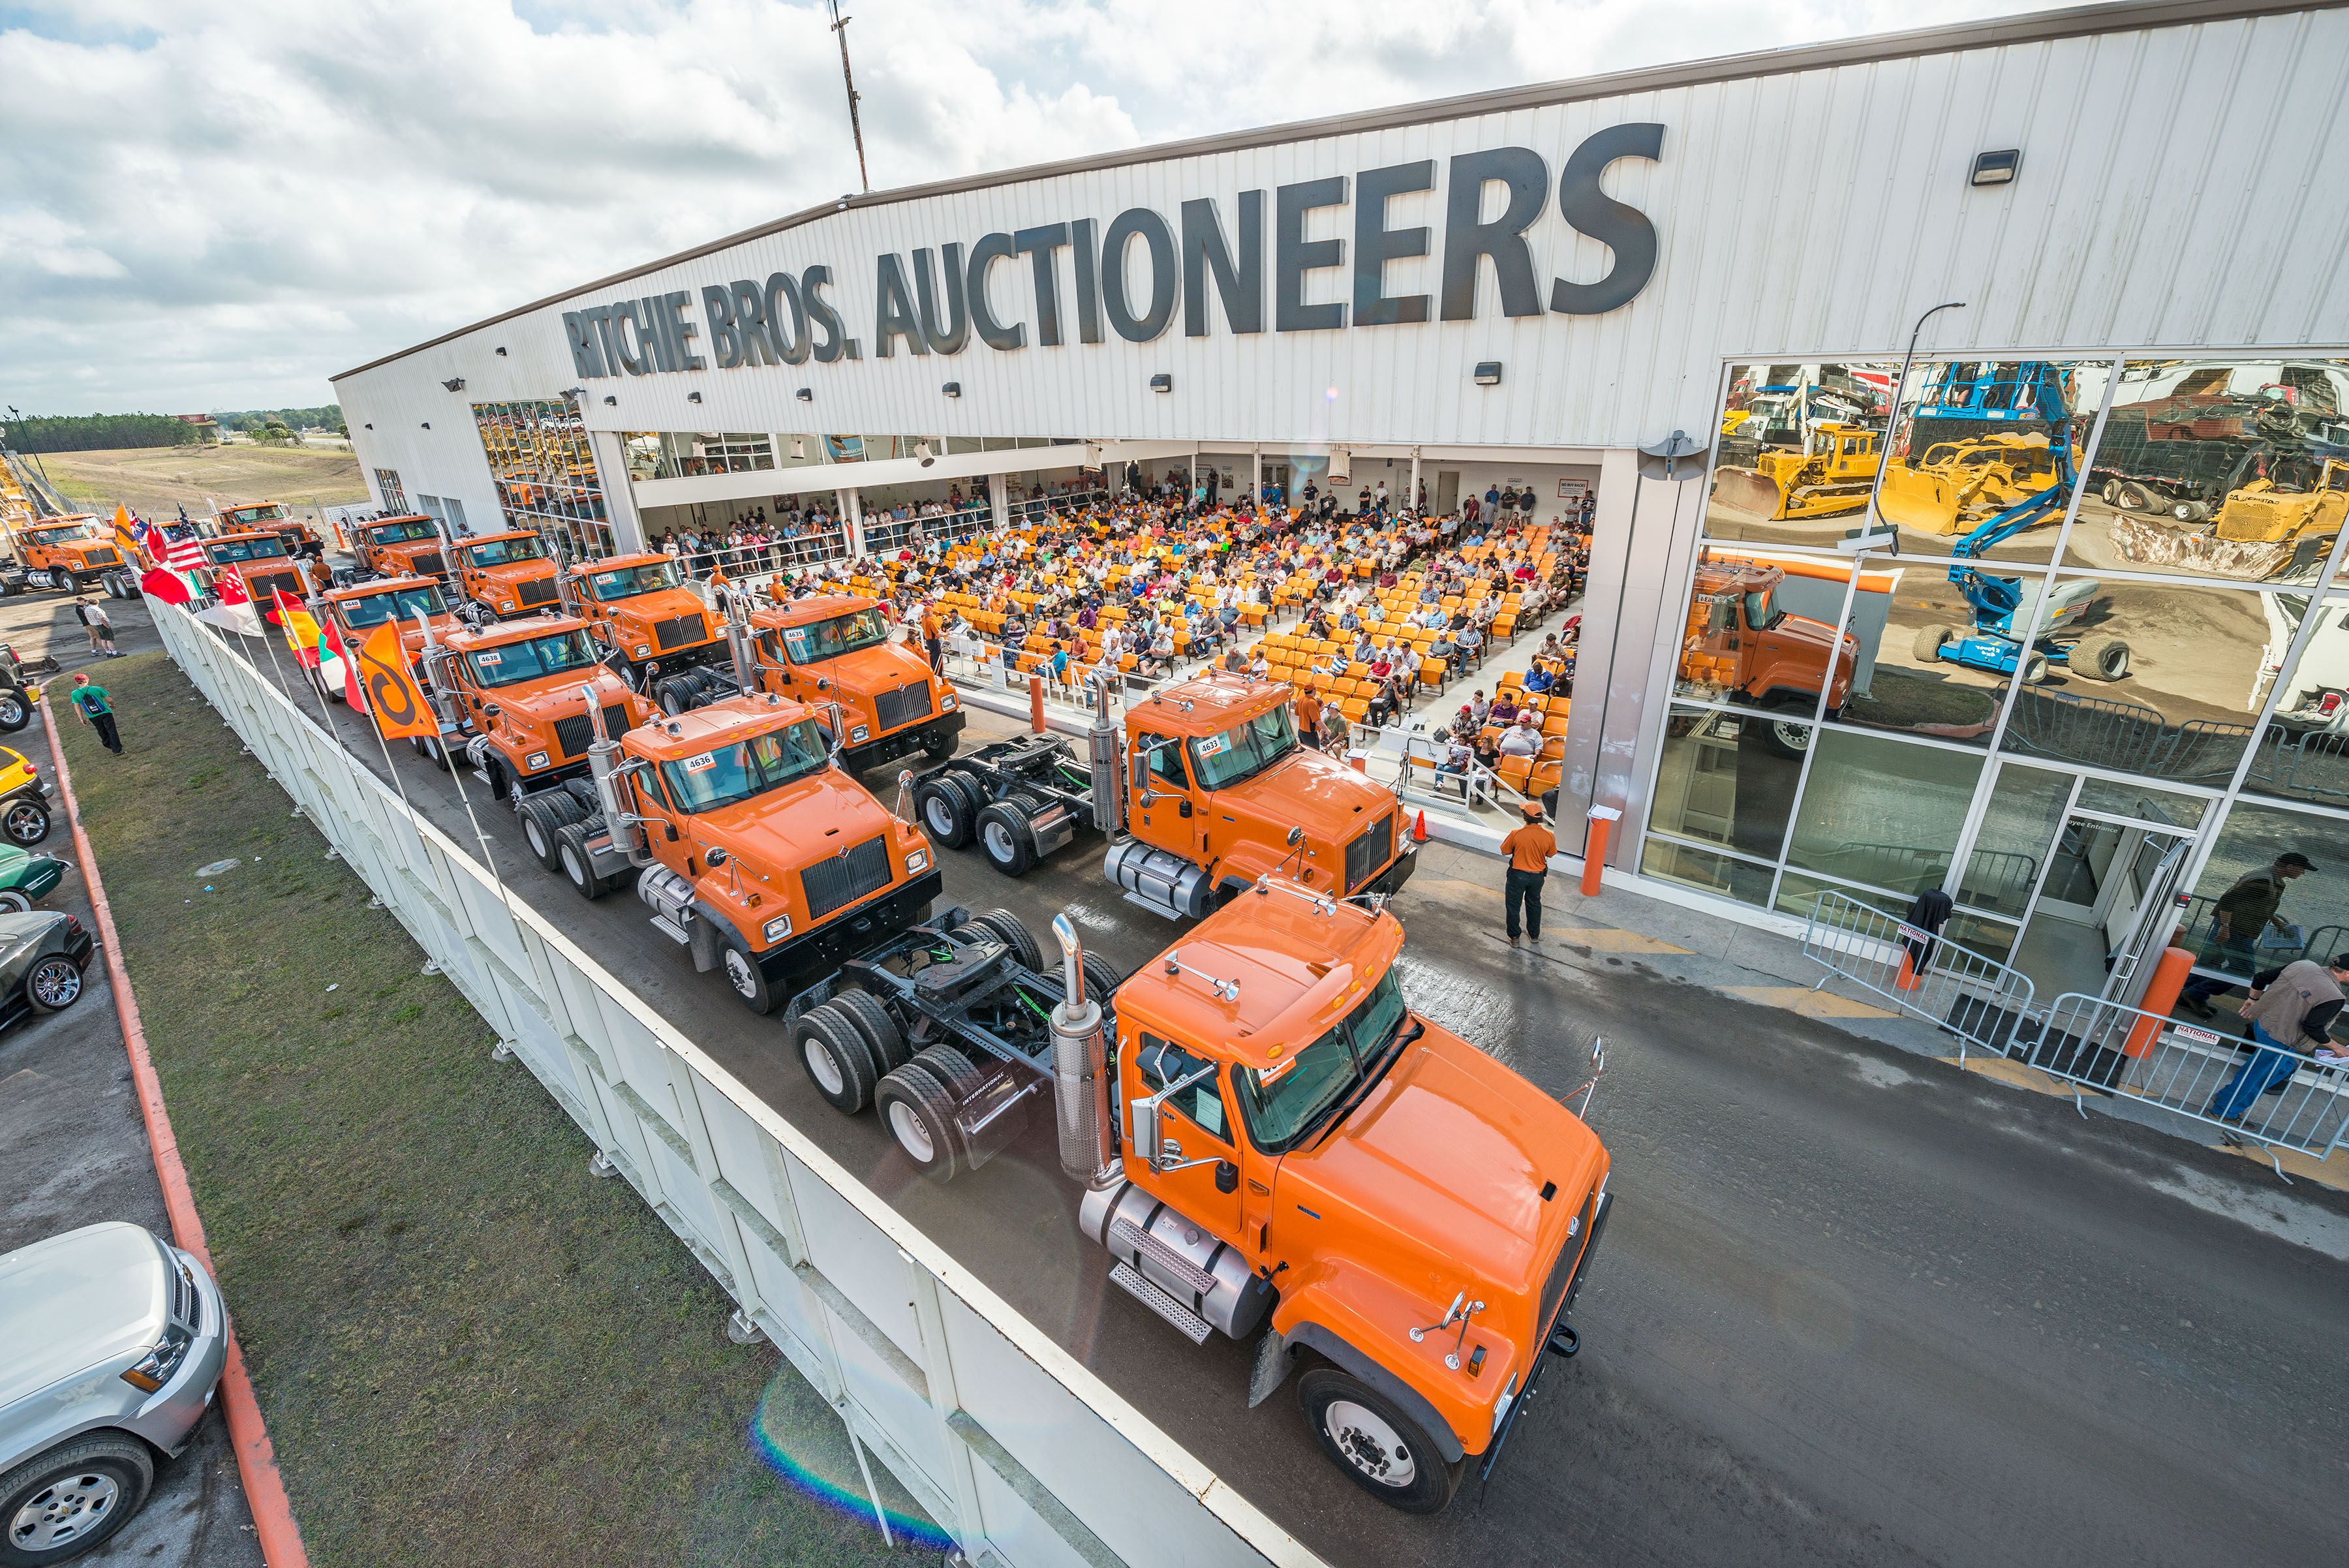 ritchie-bros-05-truck-tractors-orlando.jpg